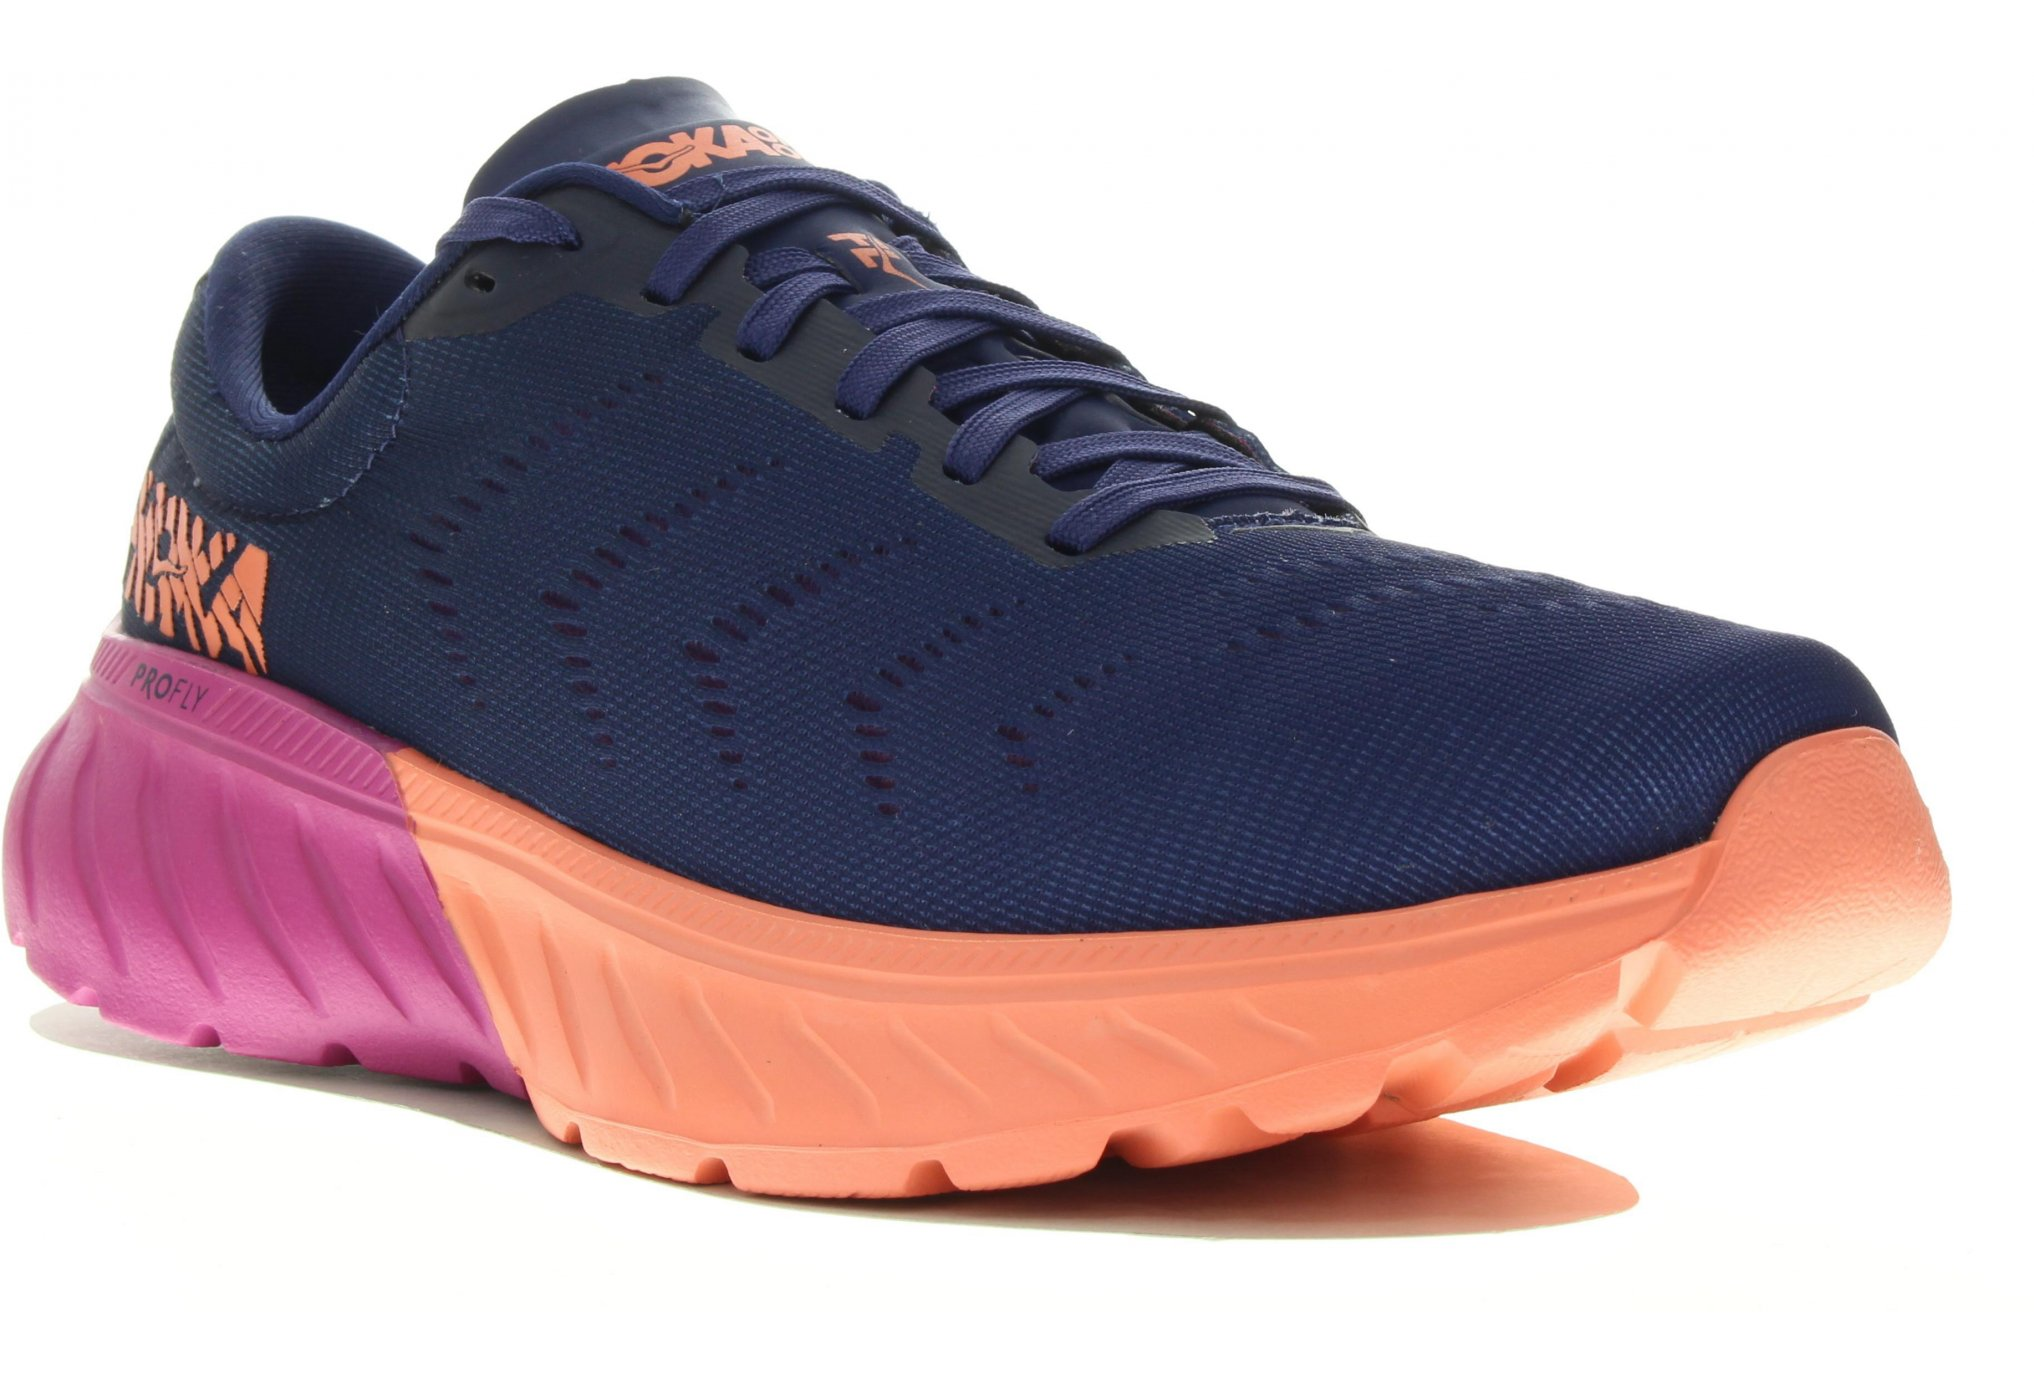 Hoka One One Mach 2 Chaussures running femme